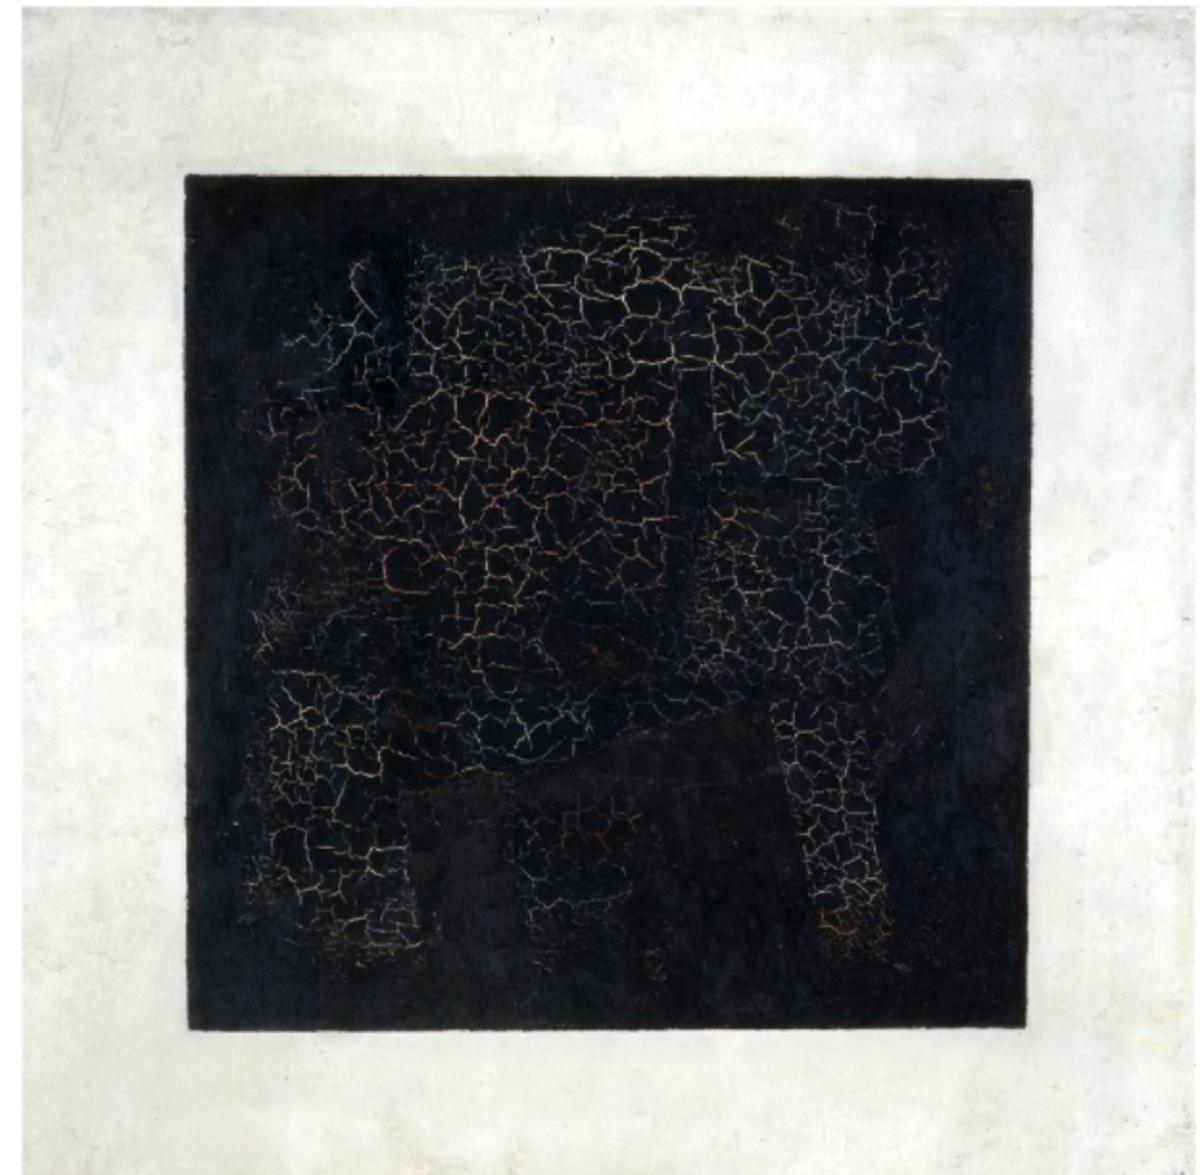 Black Square (1915), by Kazimir Malevich.